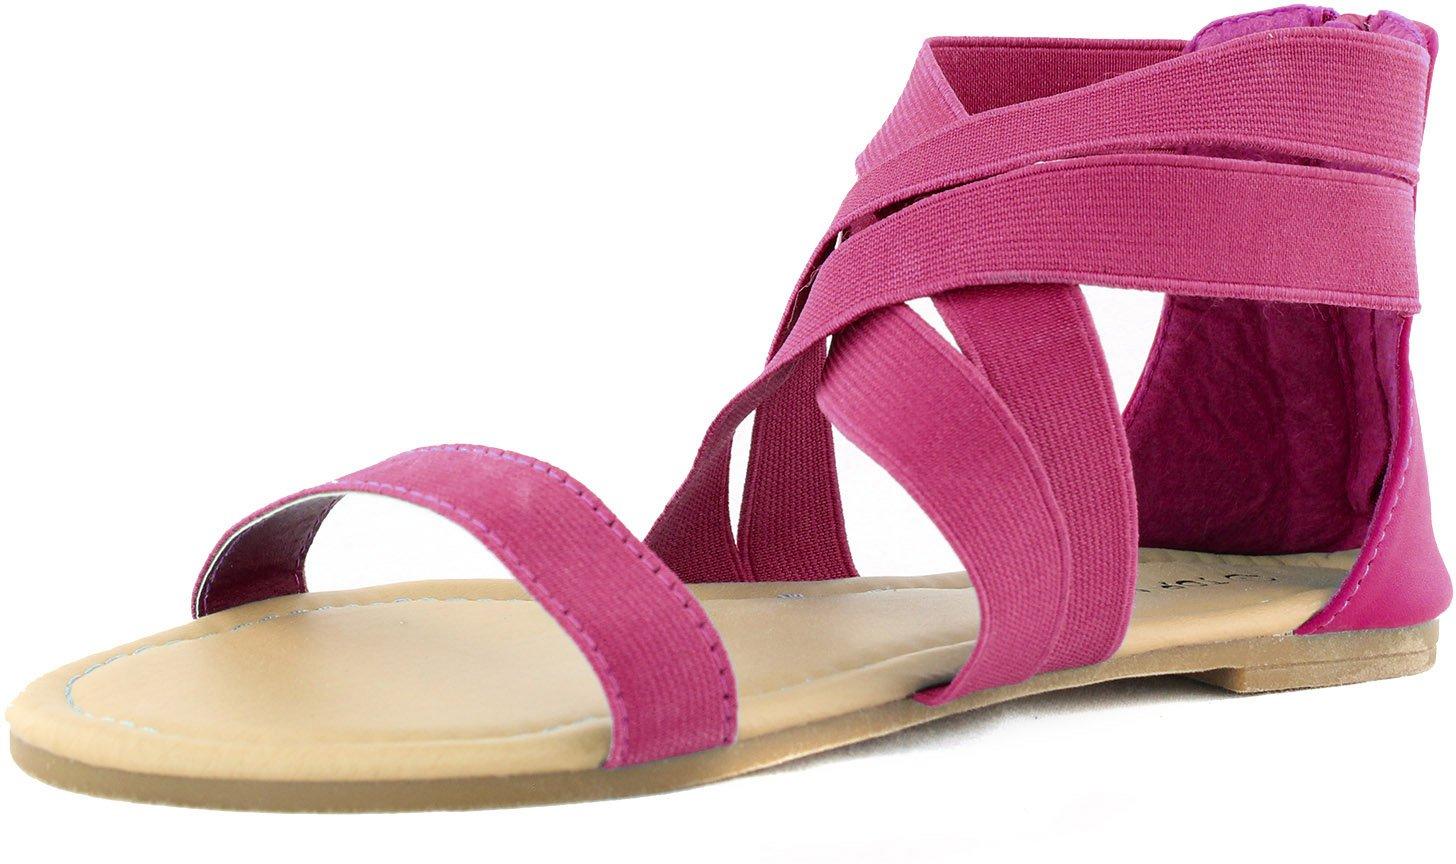 Top Moda Women's Peak-3 Fuchsia Criss Cross Causal Flat Sandals Shoes, Fuchsia, 8.5